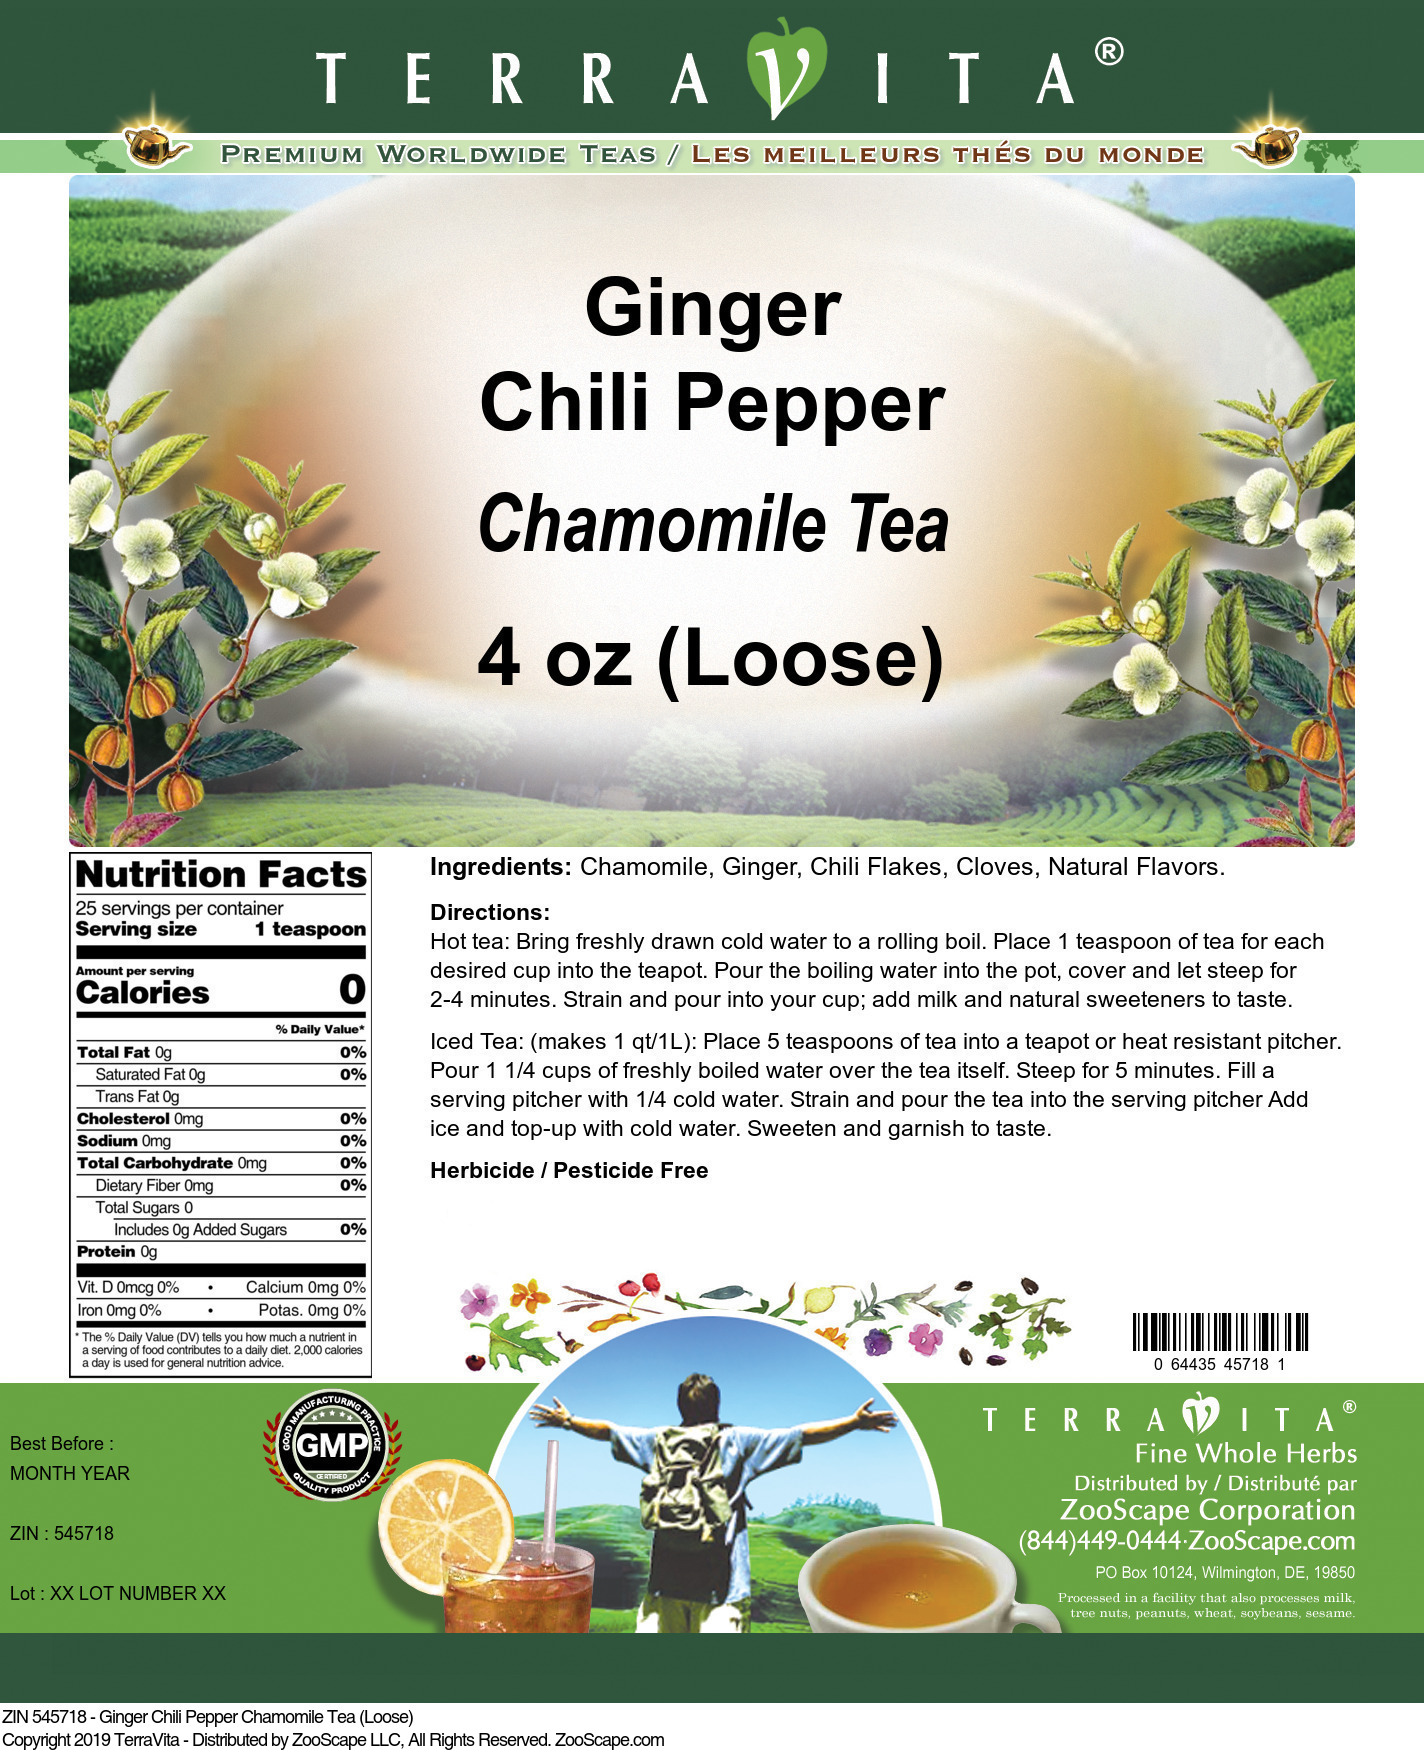 Ginger Chili Pepper Chamomile Tea (Loose)